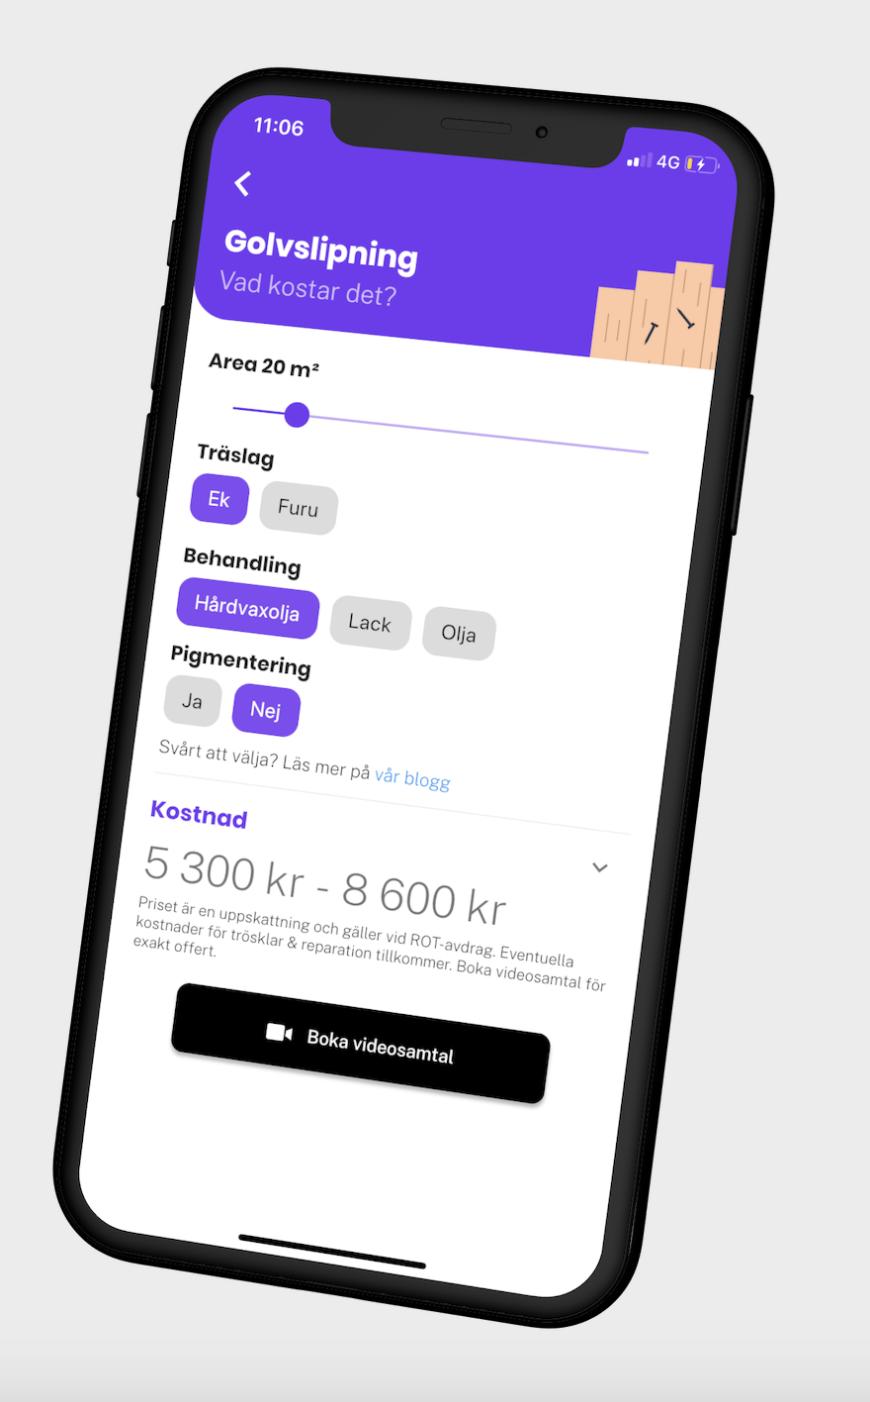 Boka golvslipning via Done - visar mobilapp